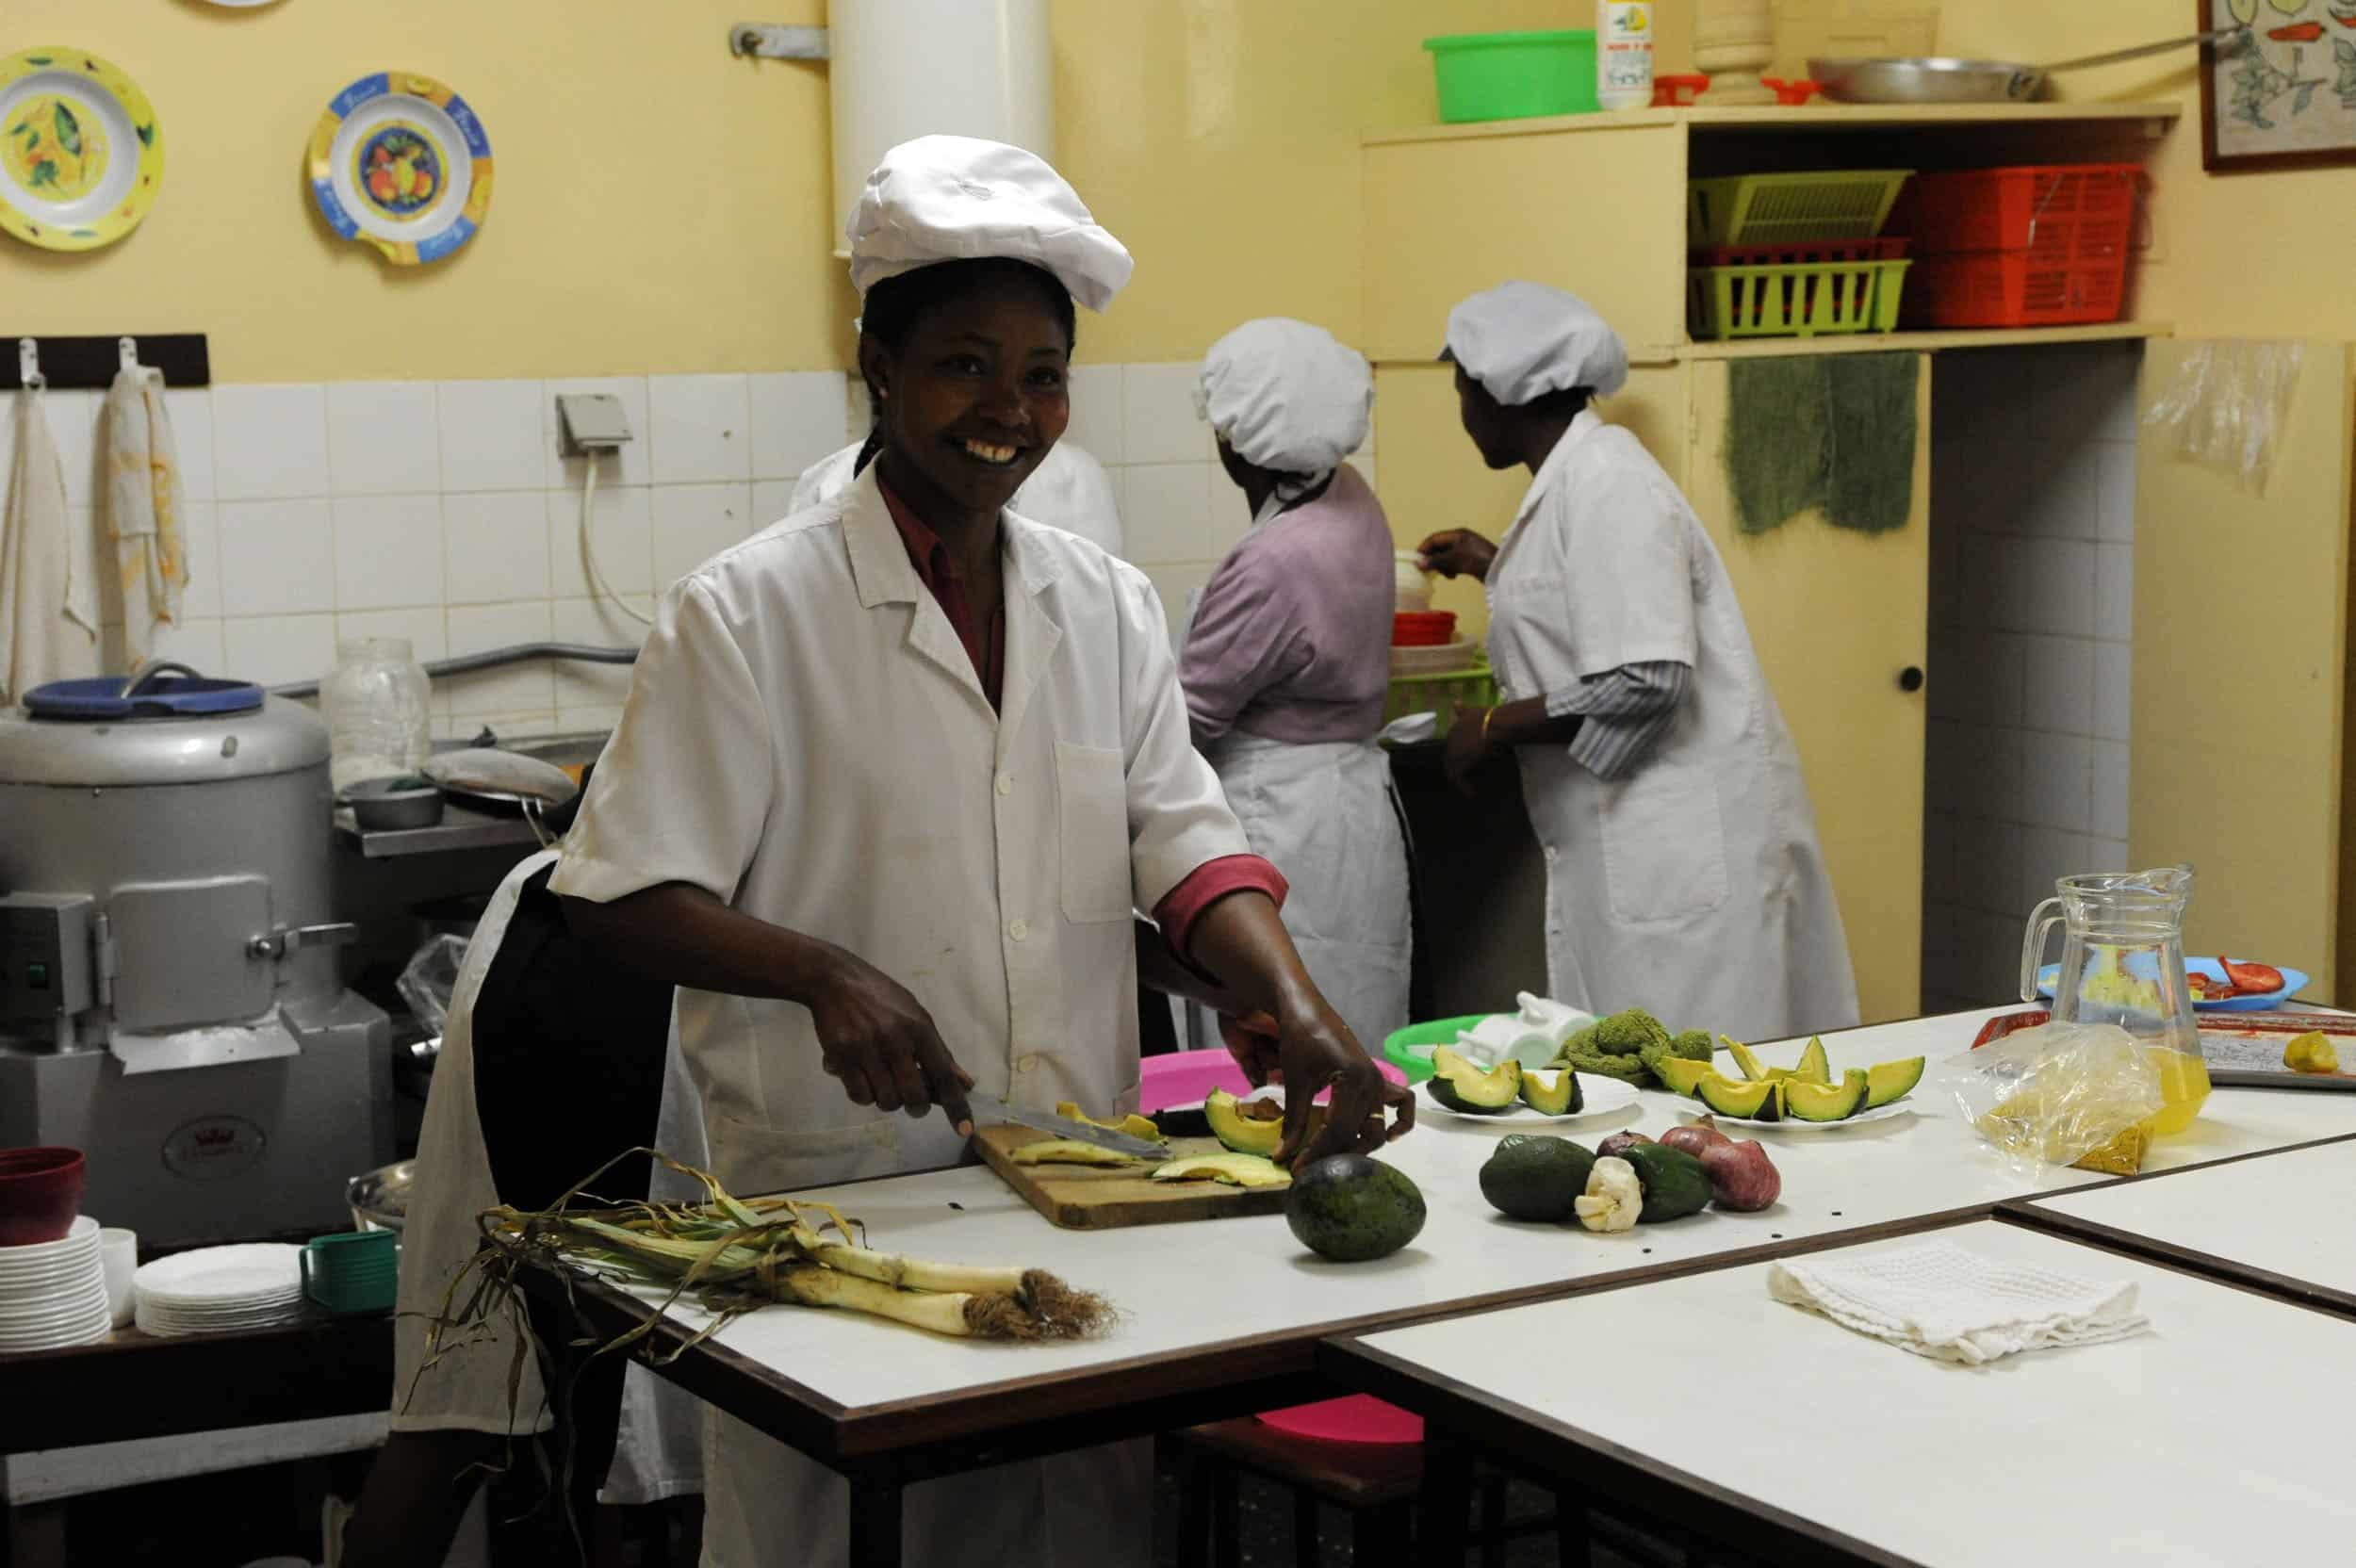 Programa de formación profesional en hostelería para mujeres jóvenes en Yaoundé